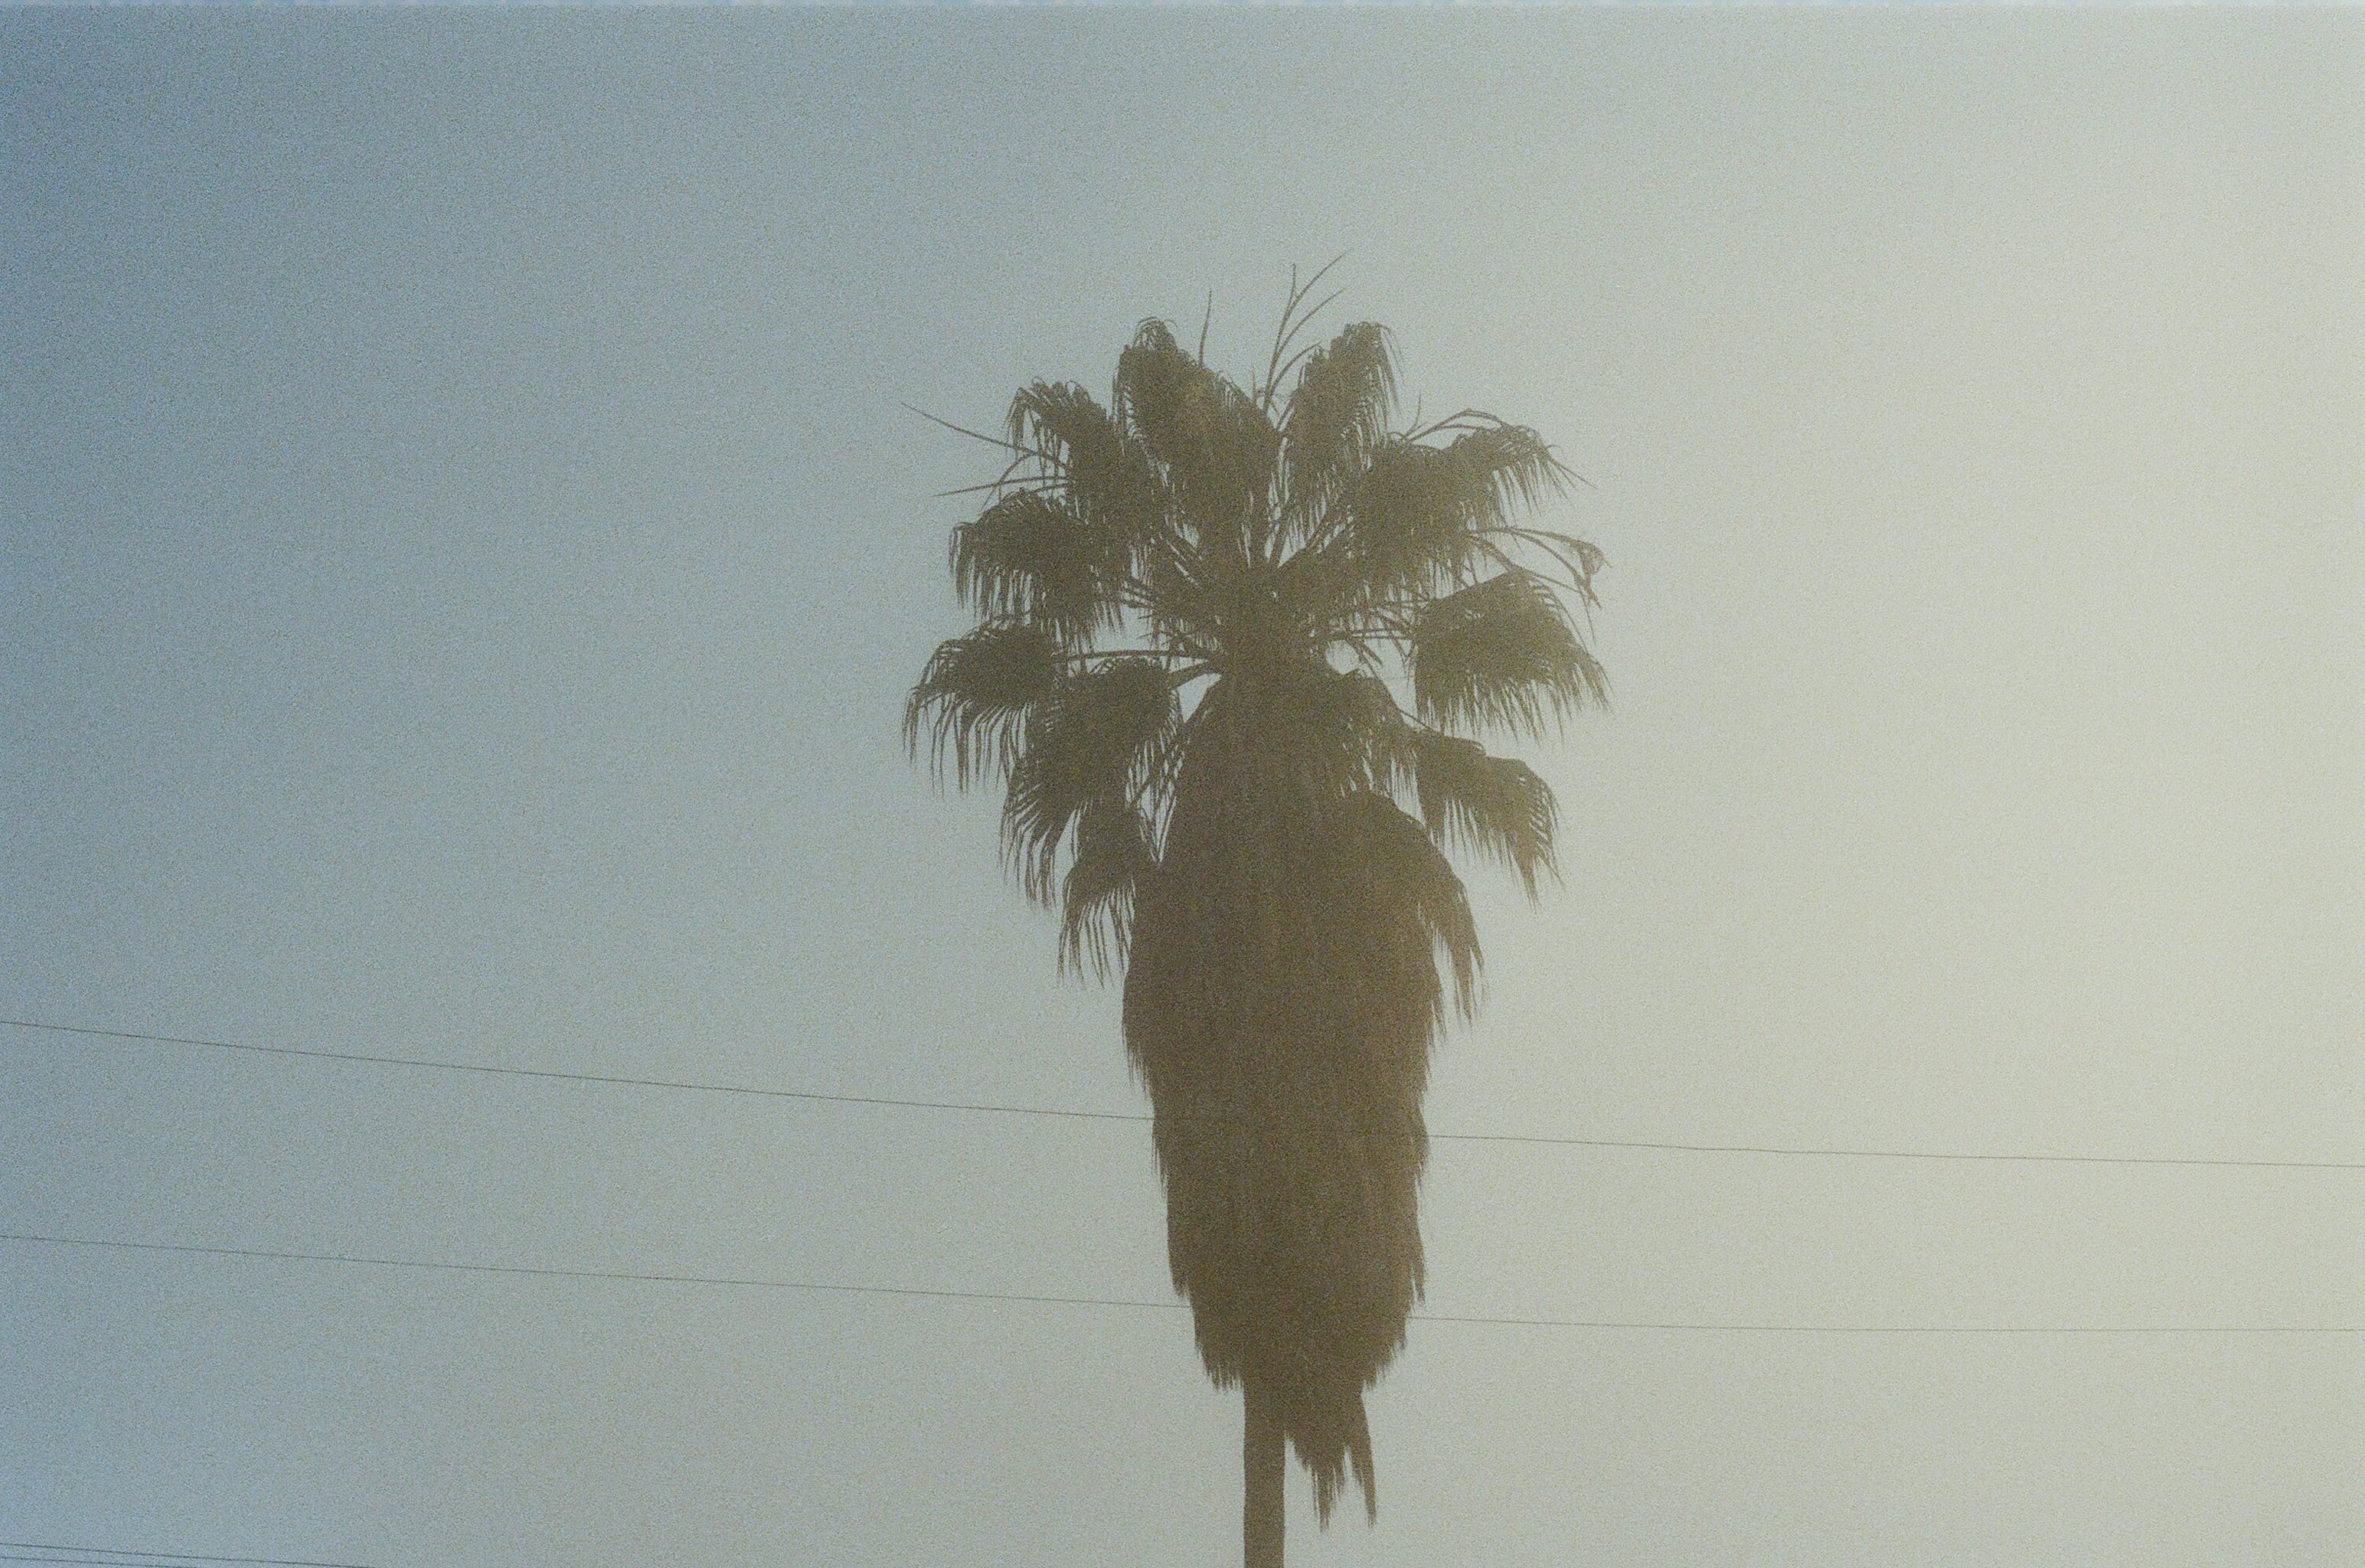 Coconut Tree Photography